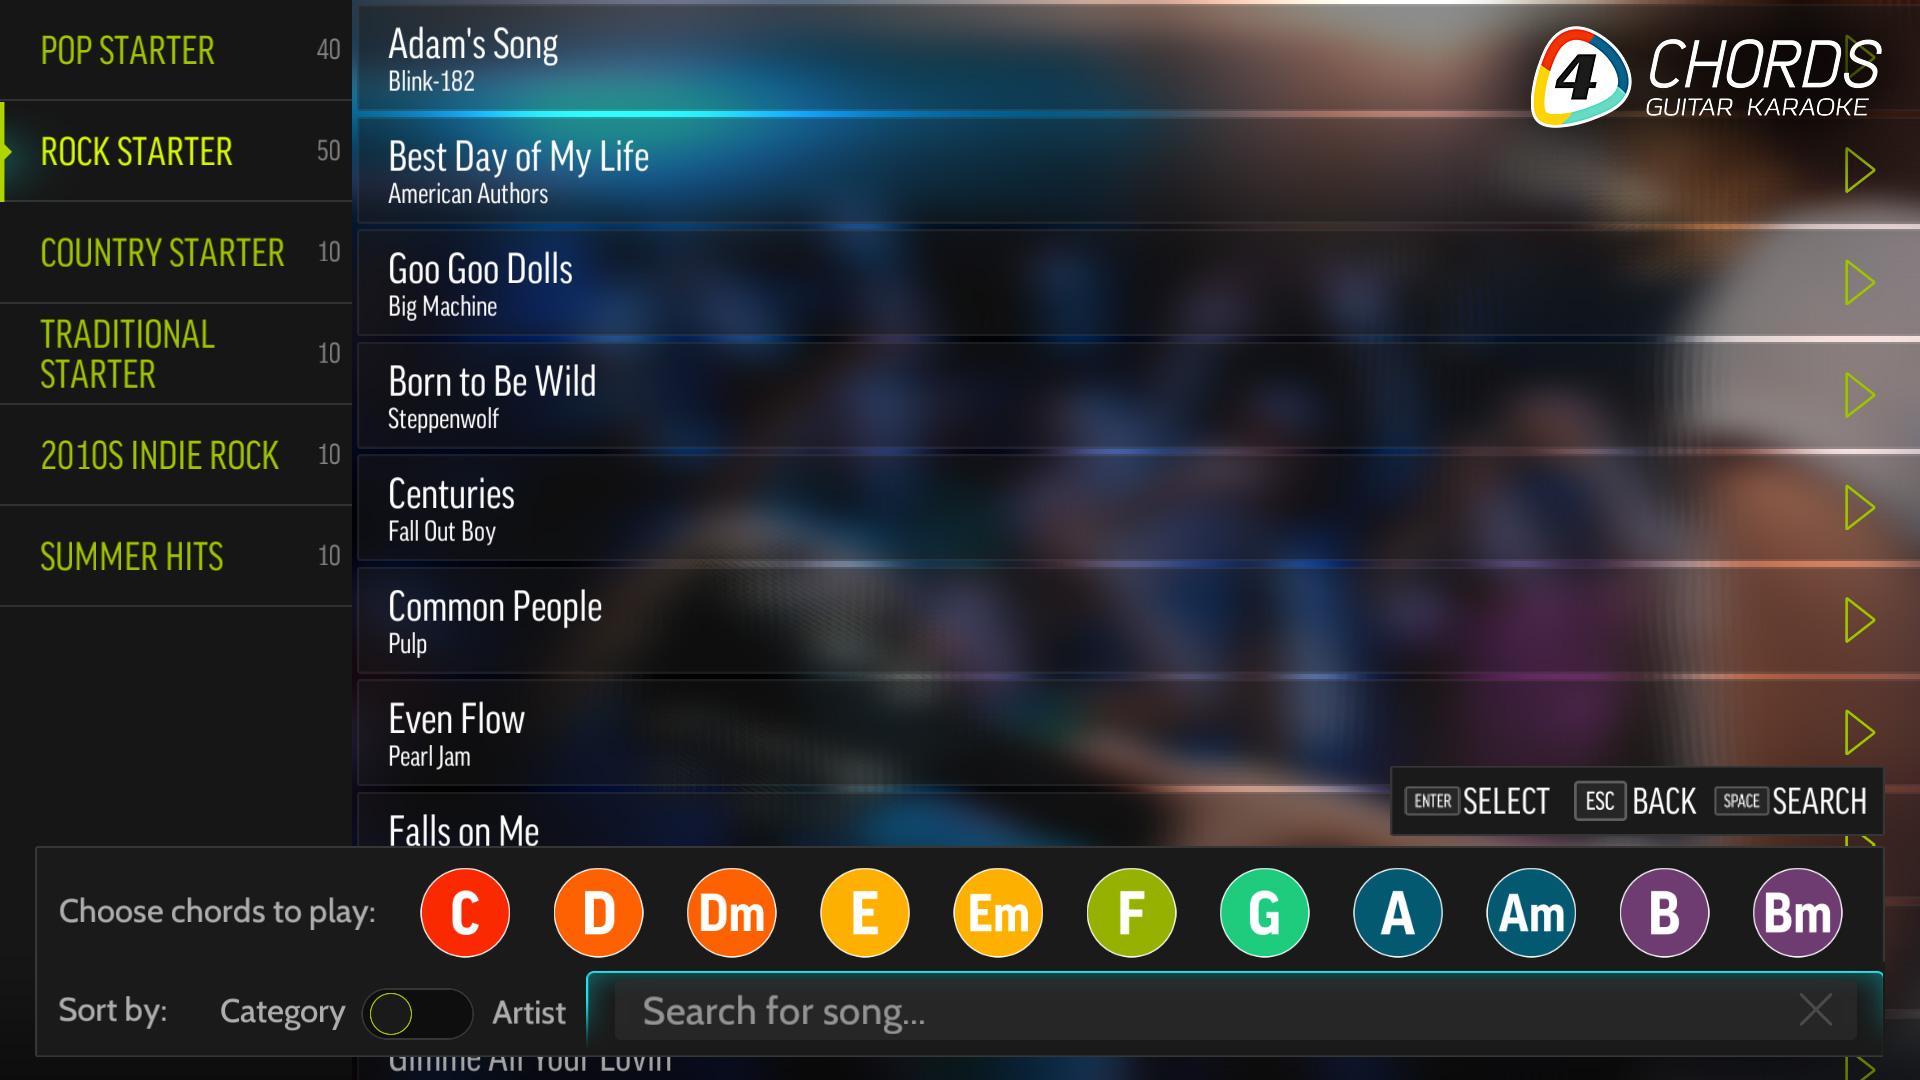 Fourchords Guitar Karaoke On Steam